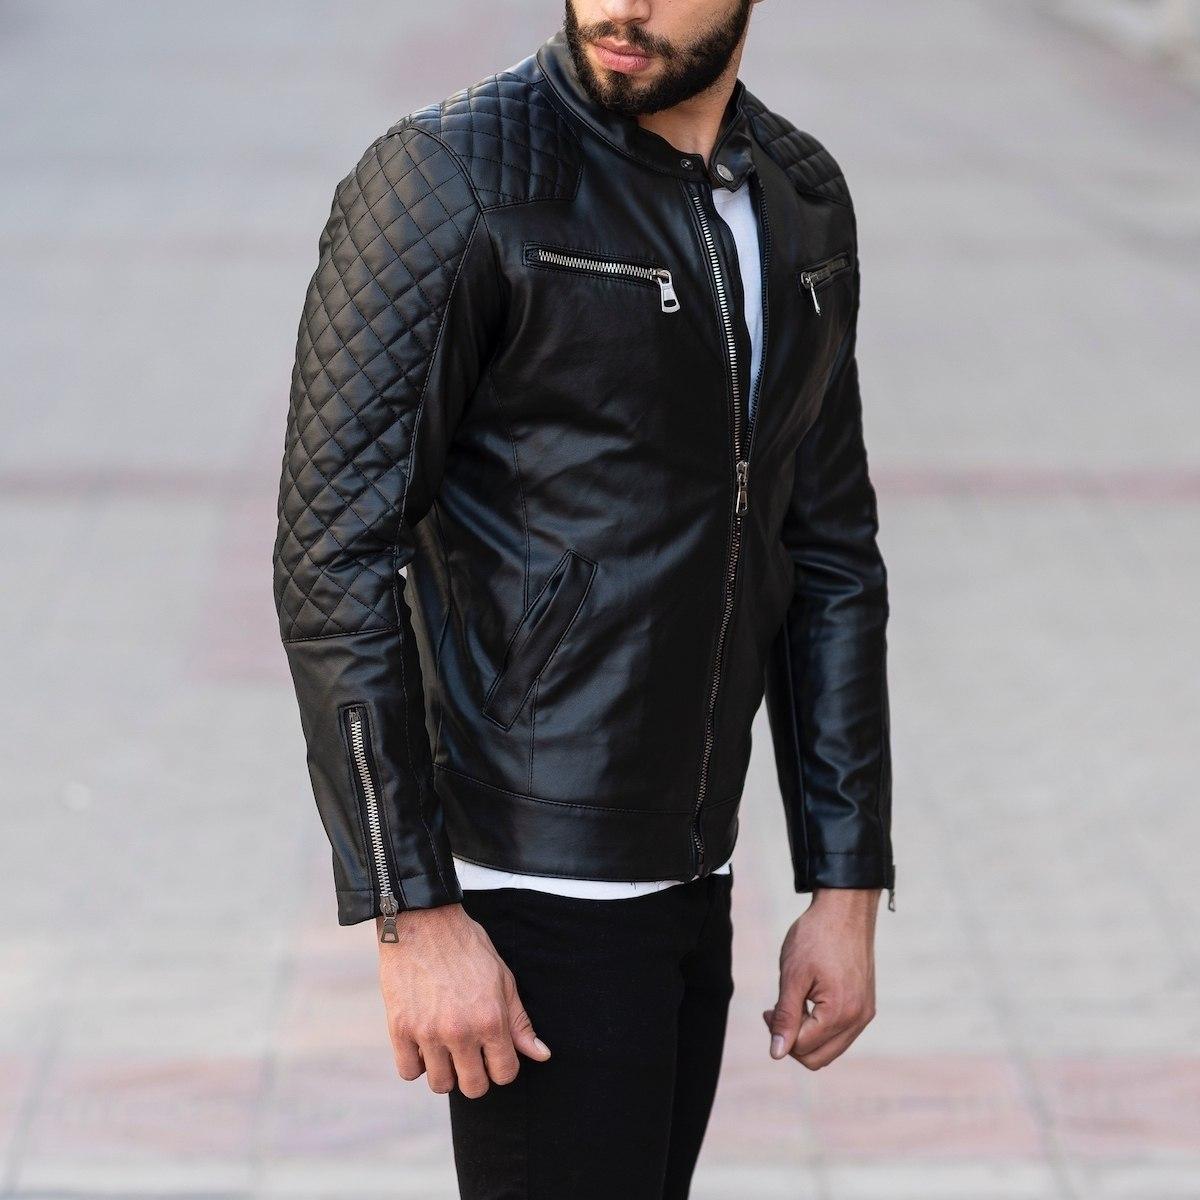 Armor Quilted Biker Jacket